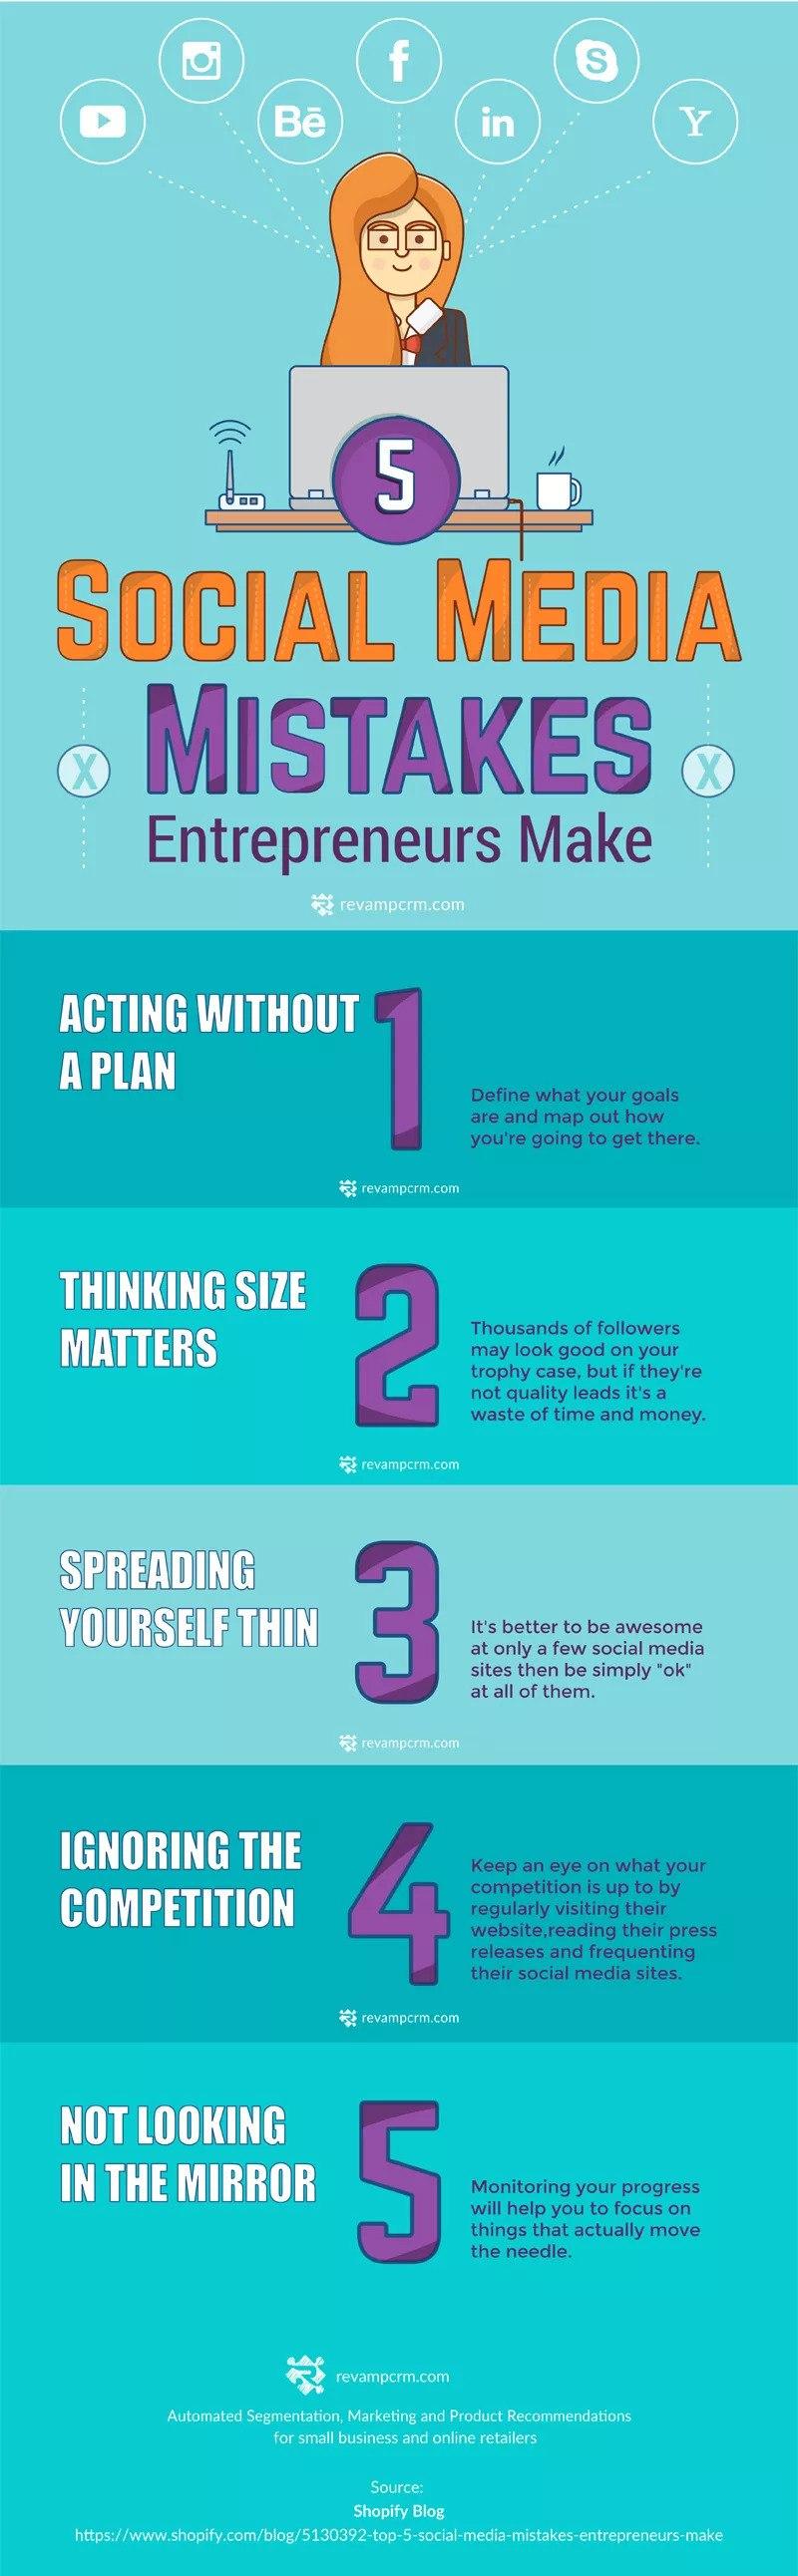 Top 5 Social Media Mistakes Entrepreneurs Make Infographic Idea1